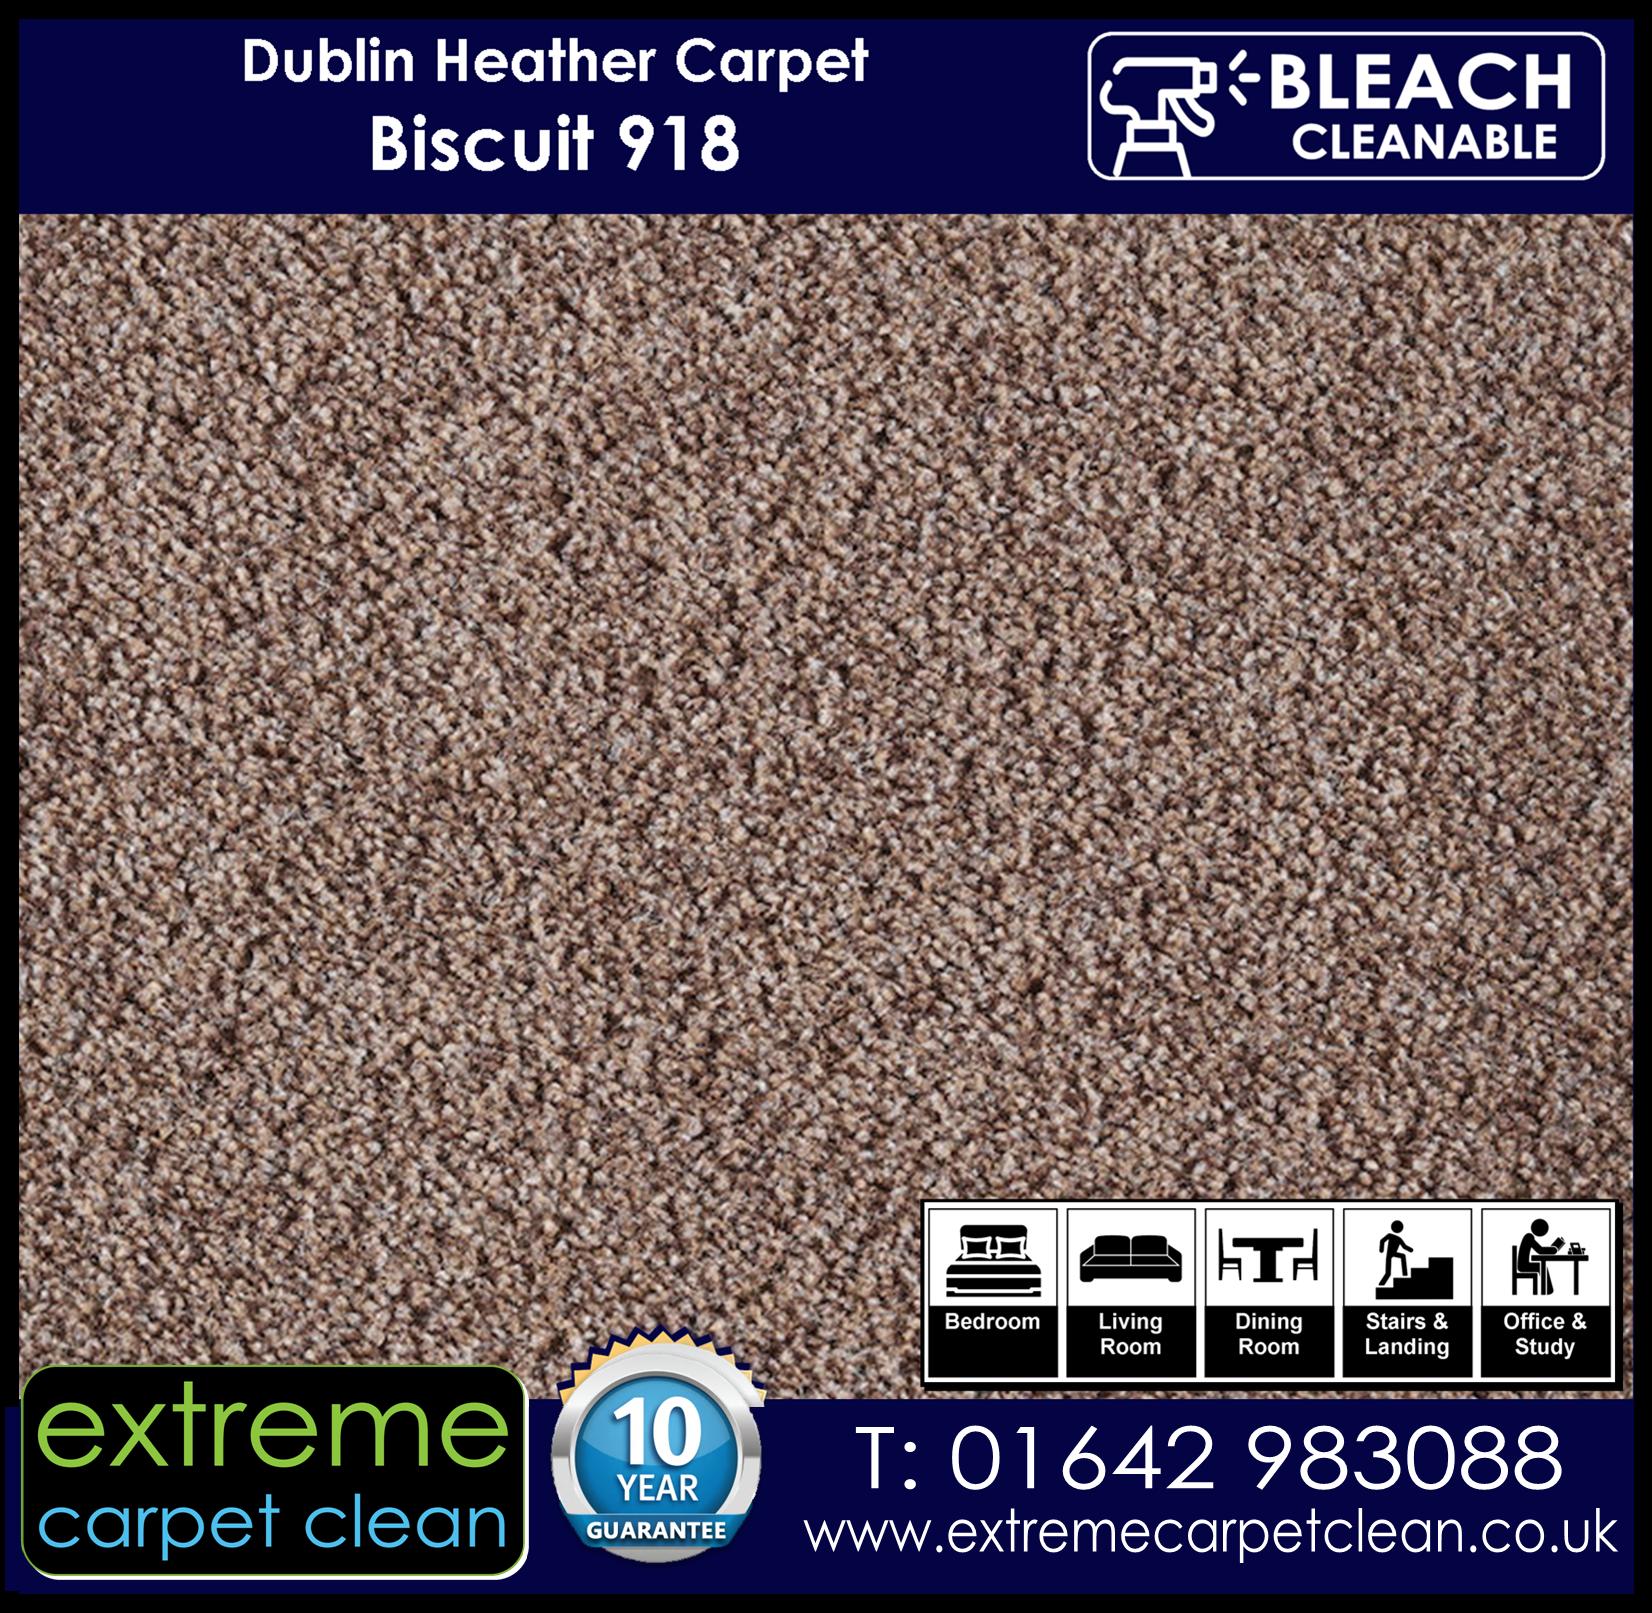 Dublin Heather Carpet Range. Biscuit 918 Extreme Carpet Clean